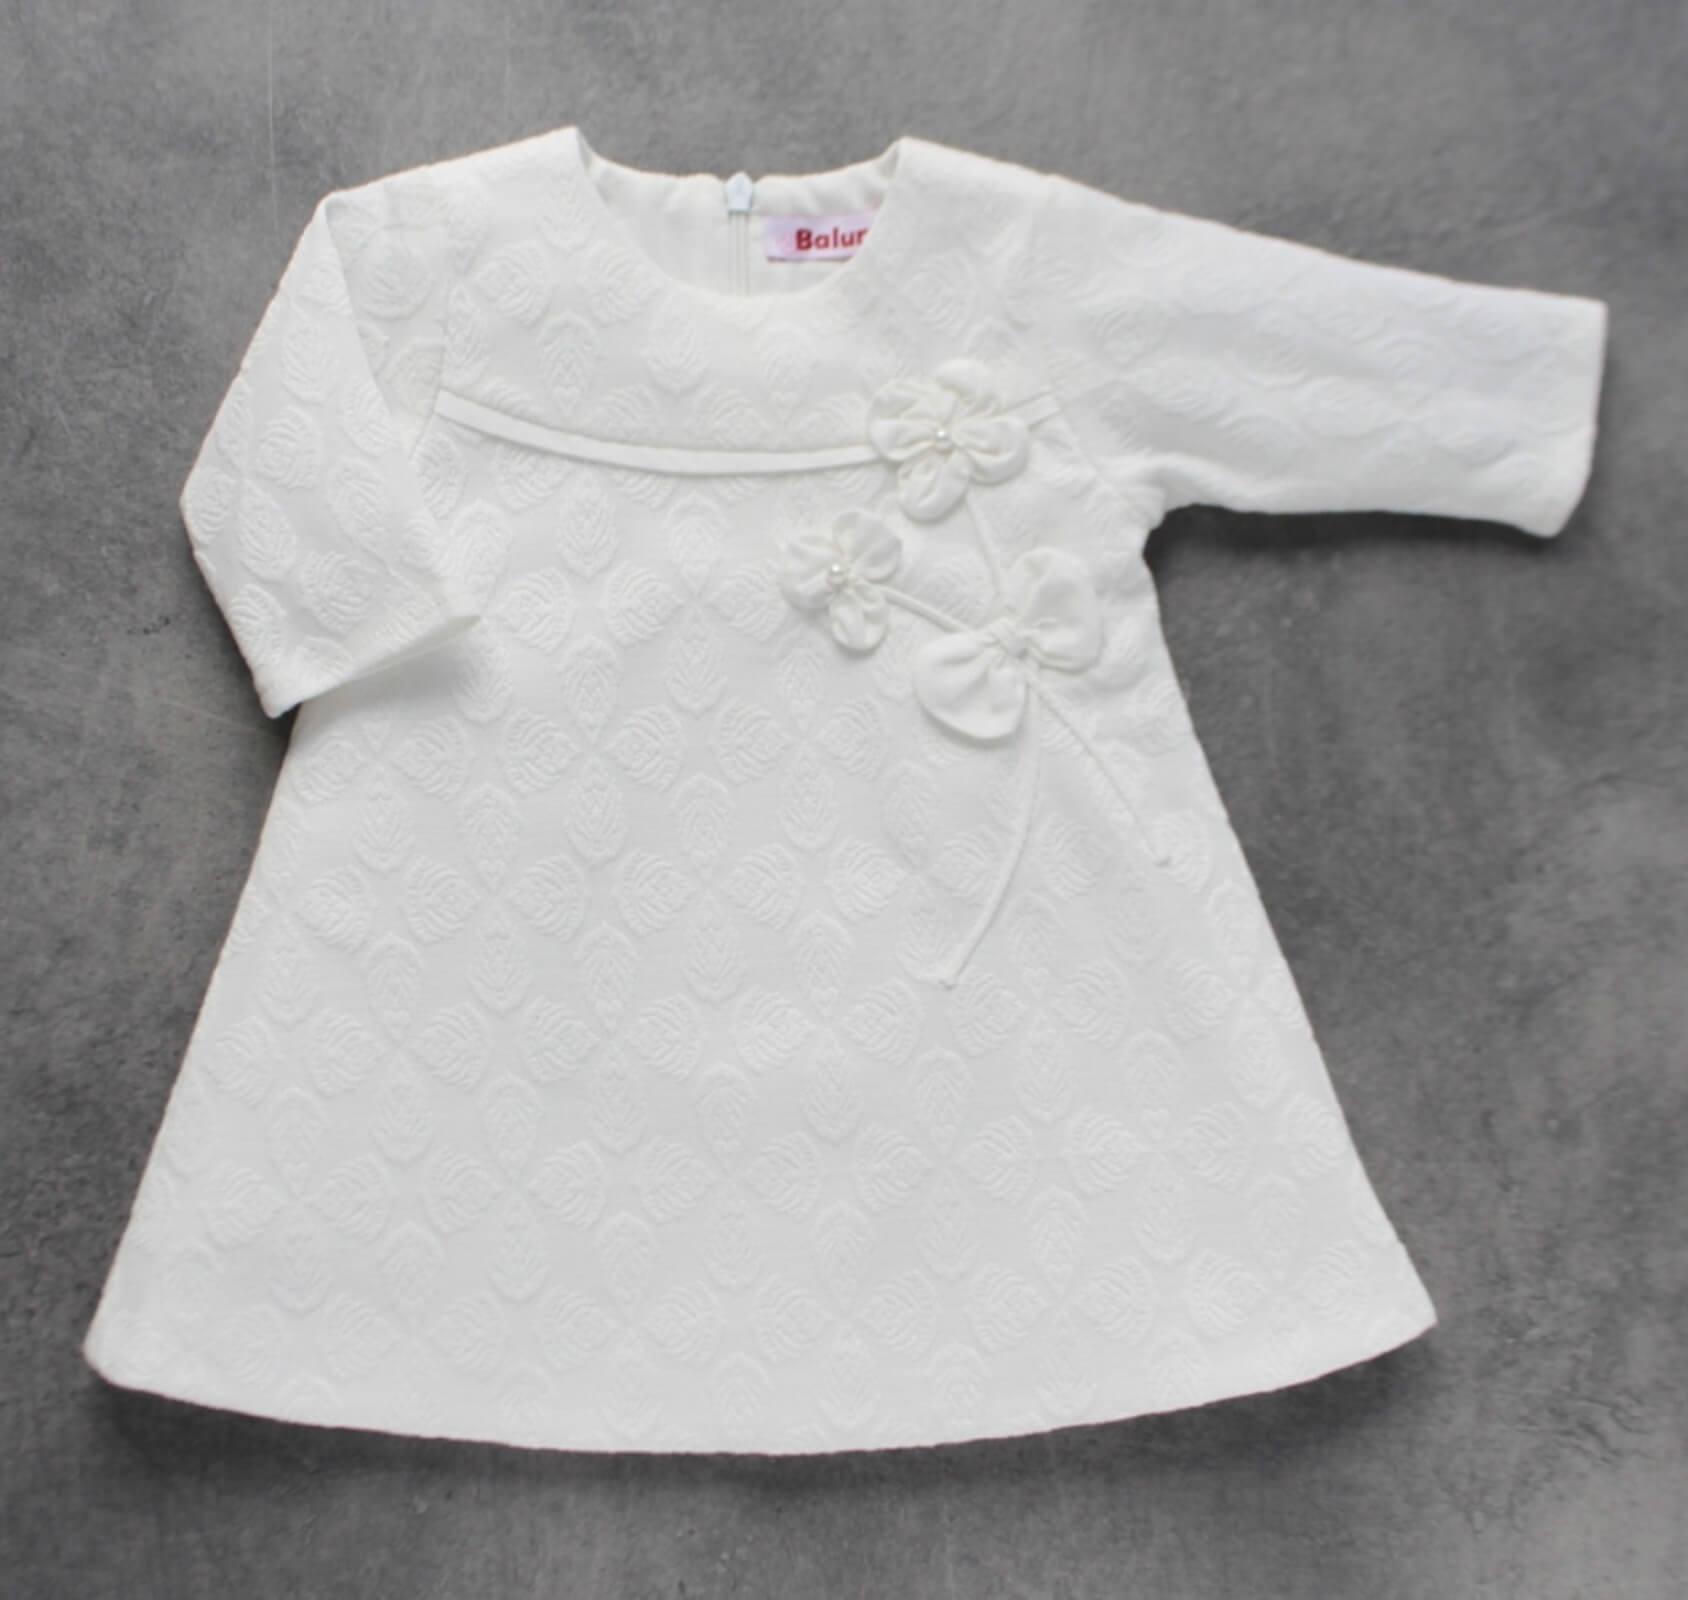 sukienka-do-chrztu-z-balumi